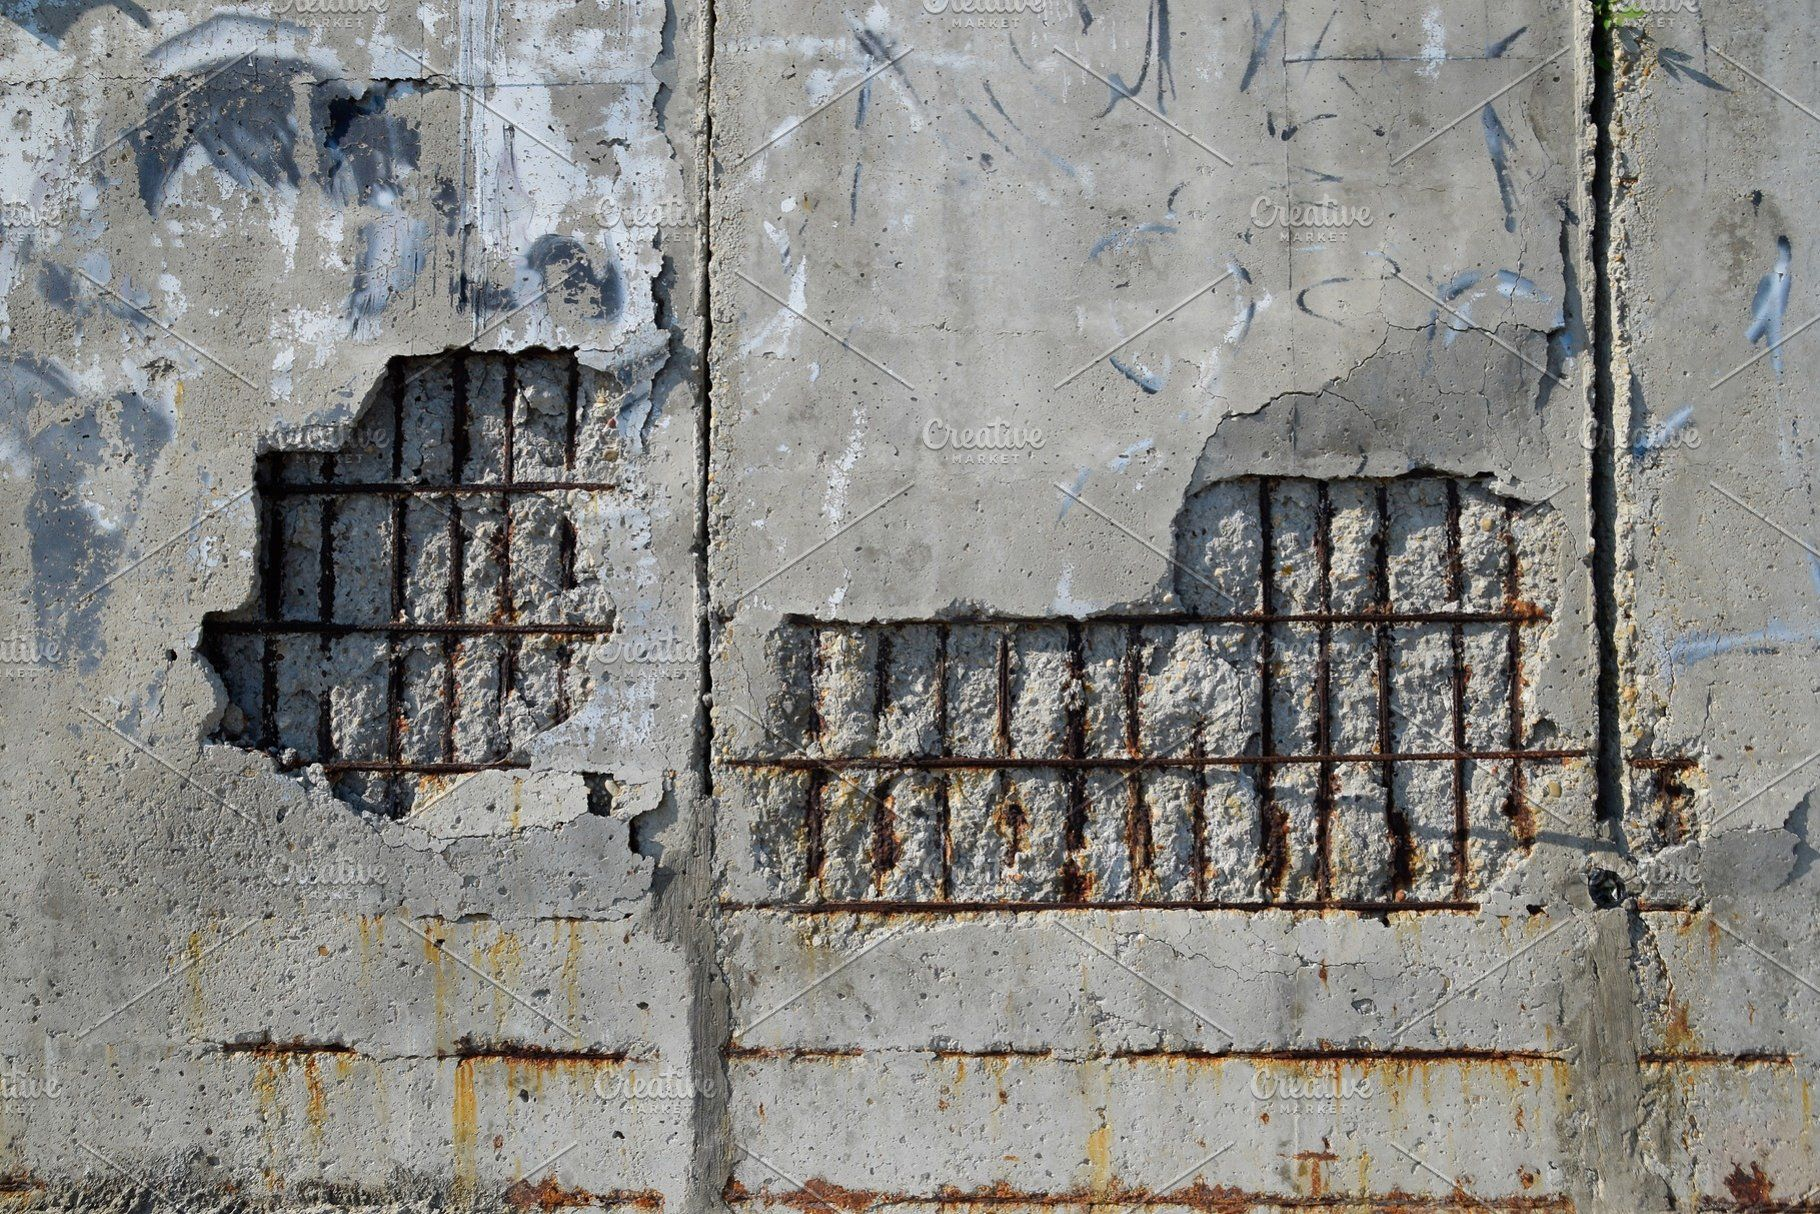 Destroying Wall Of Reinforced Reinforced Concrete Wall Creative Market